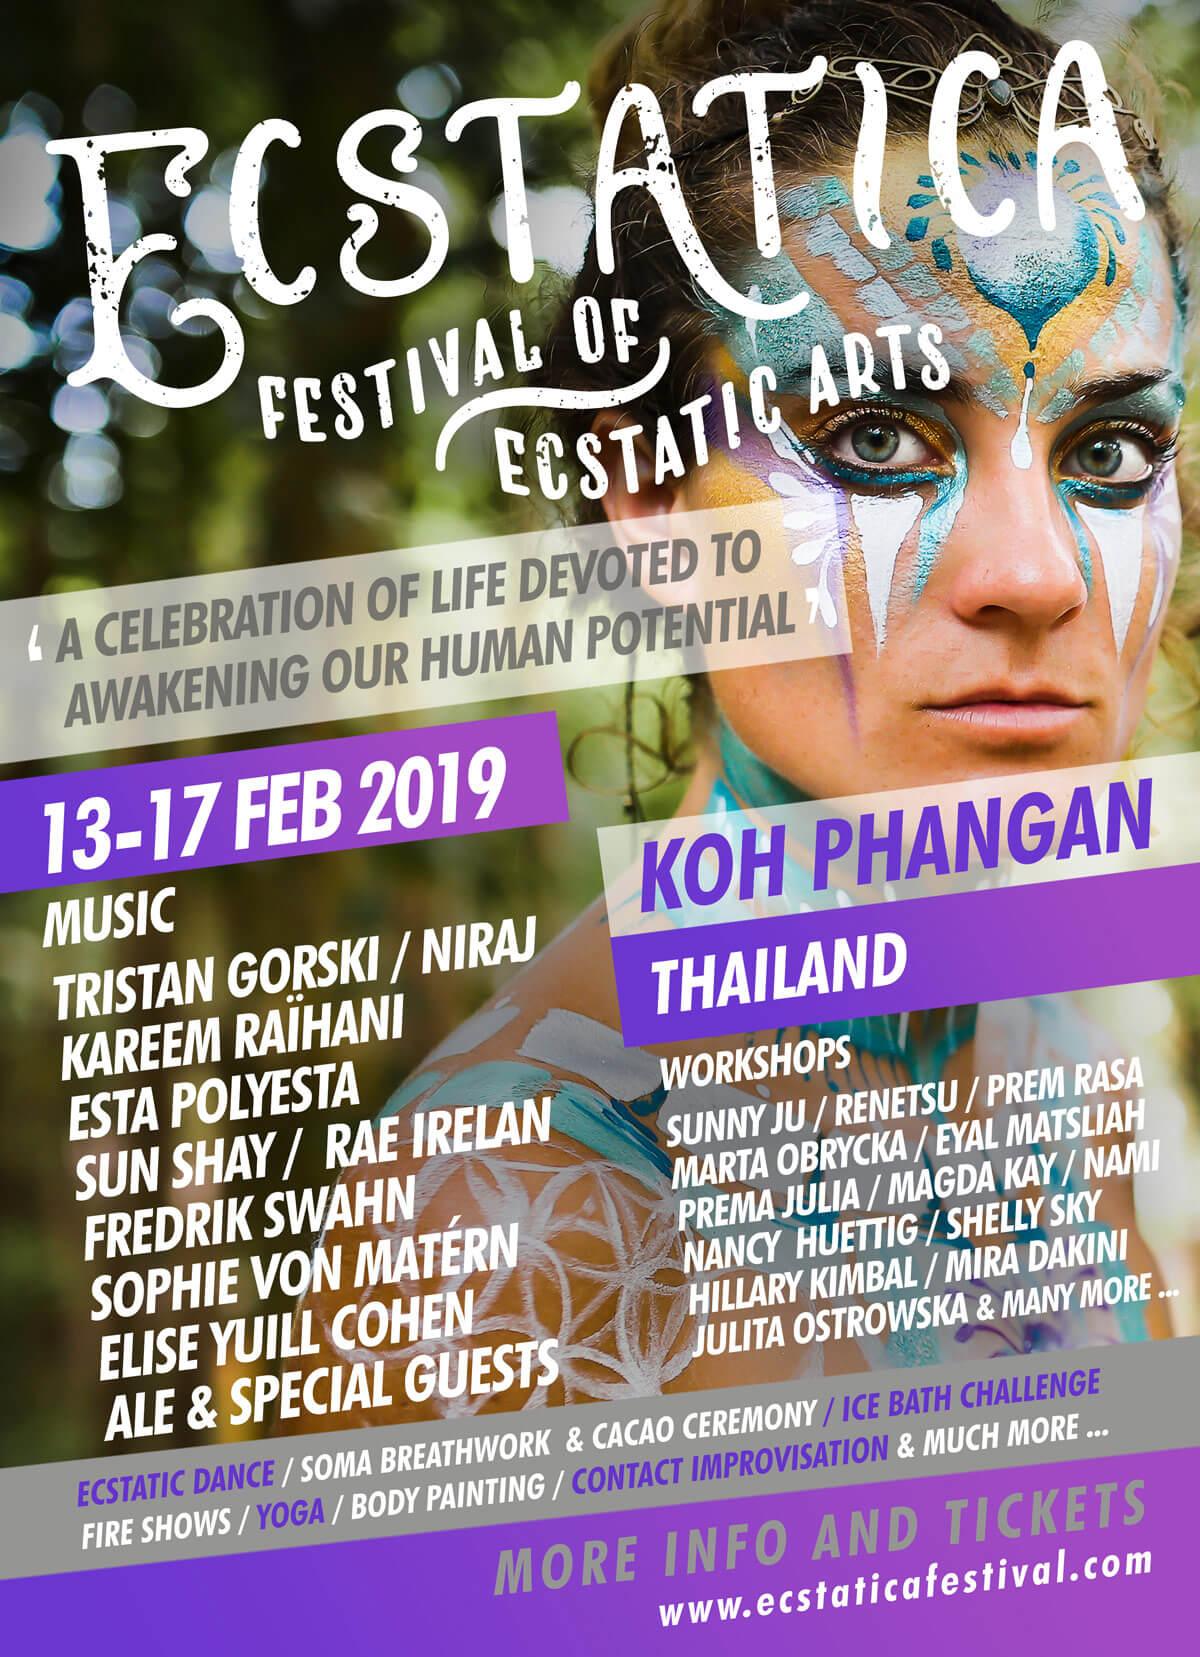 ecstatica festival koh phangan thailand festiavl lineup